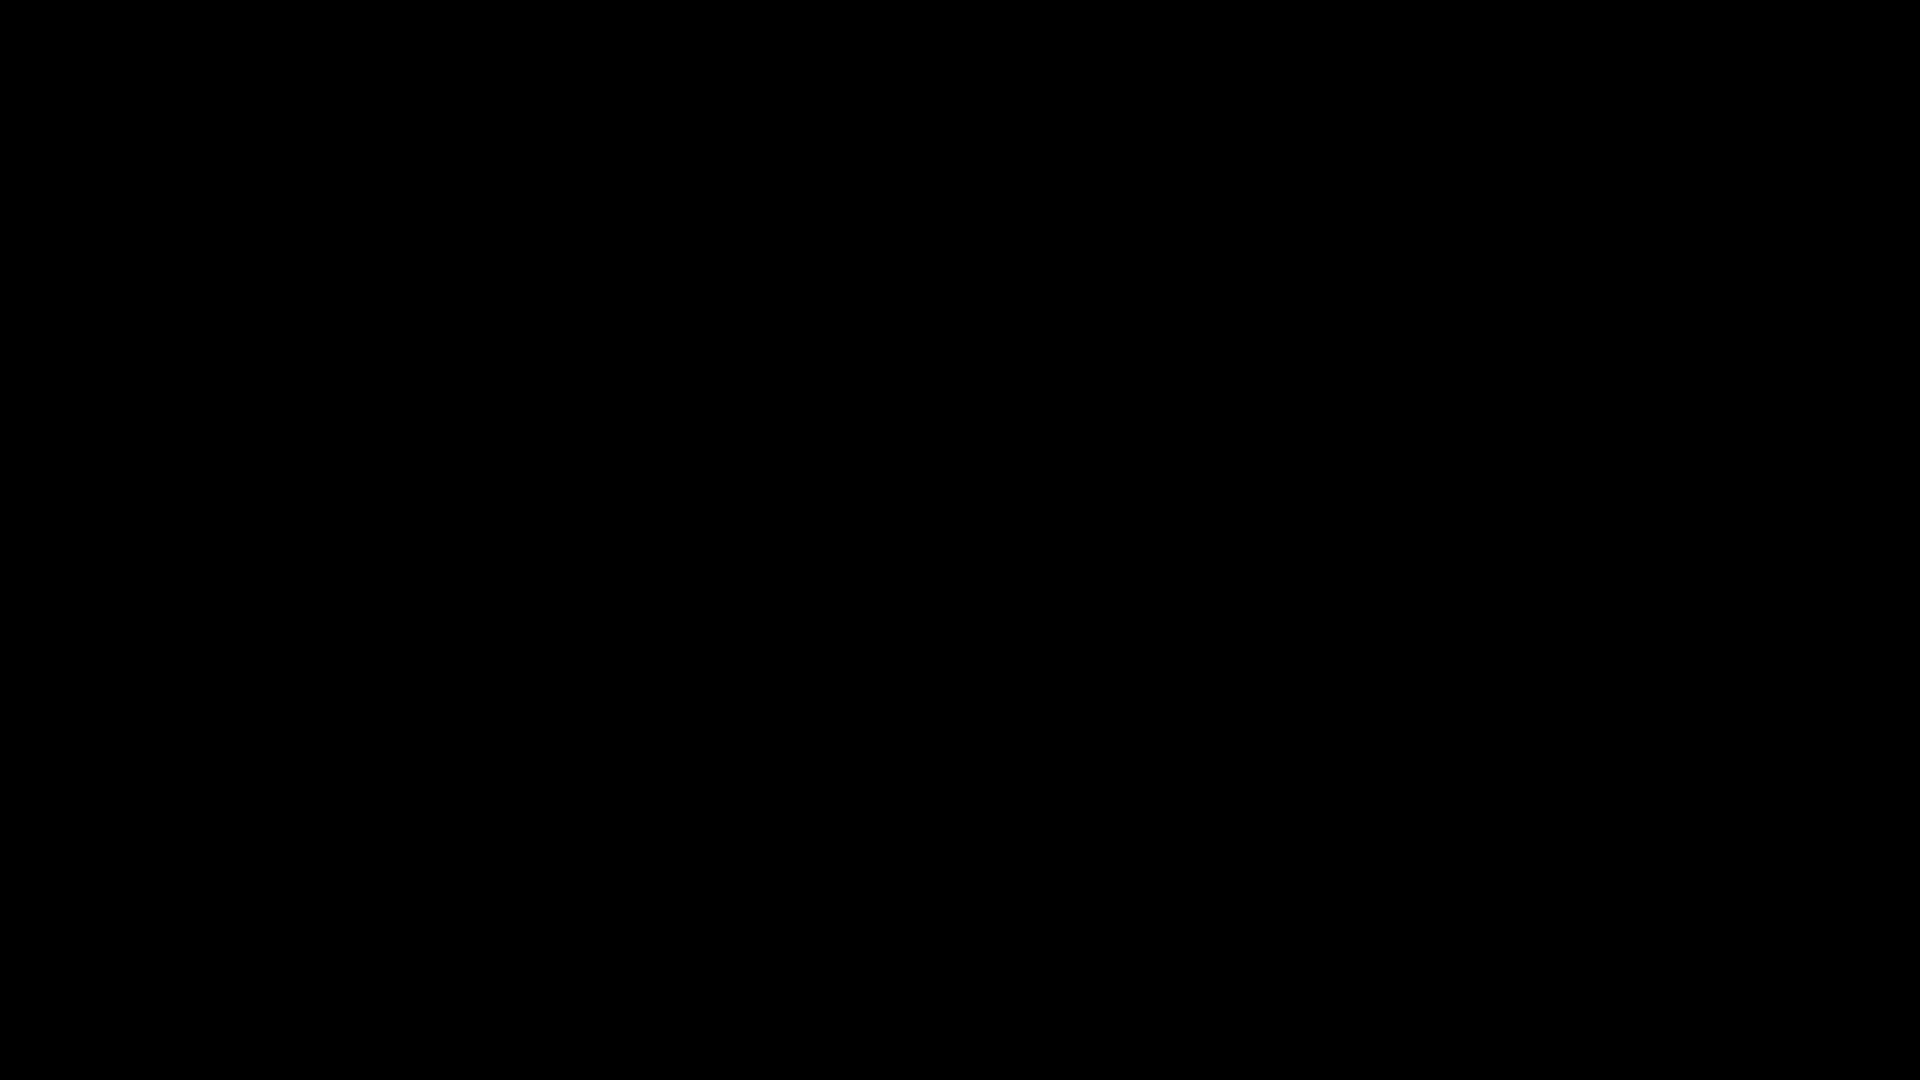 Black bars clipart 1920x1080 svg download Free collection of Black bars png. Download transparent clip arts on ... svg download